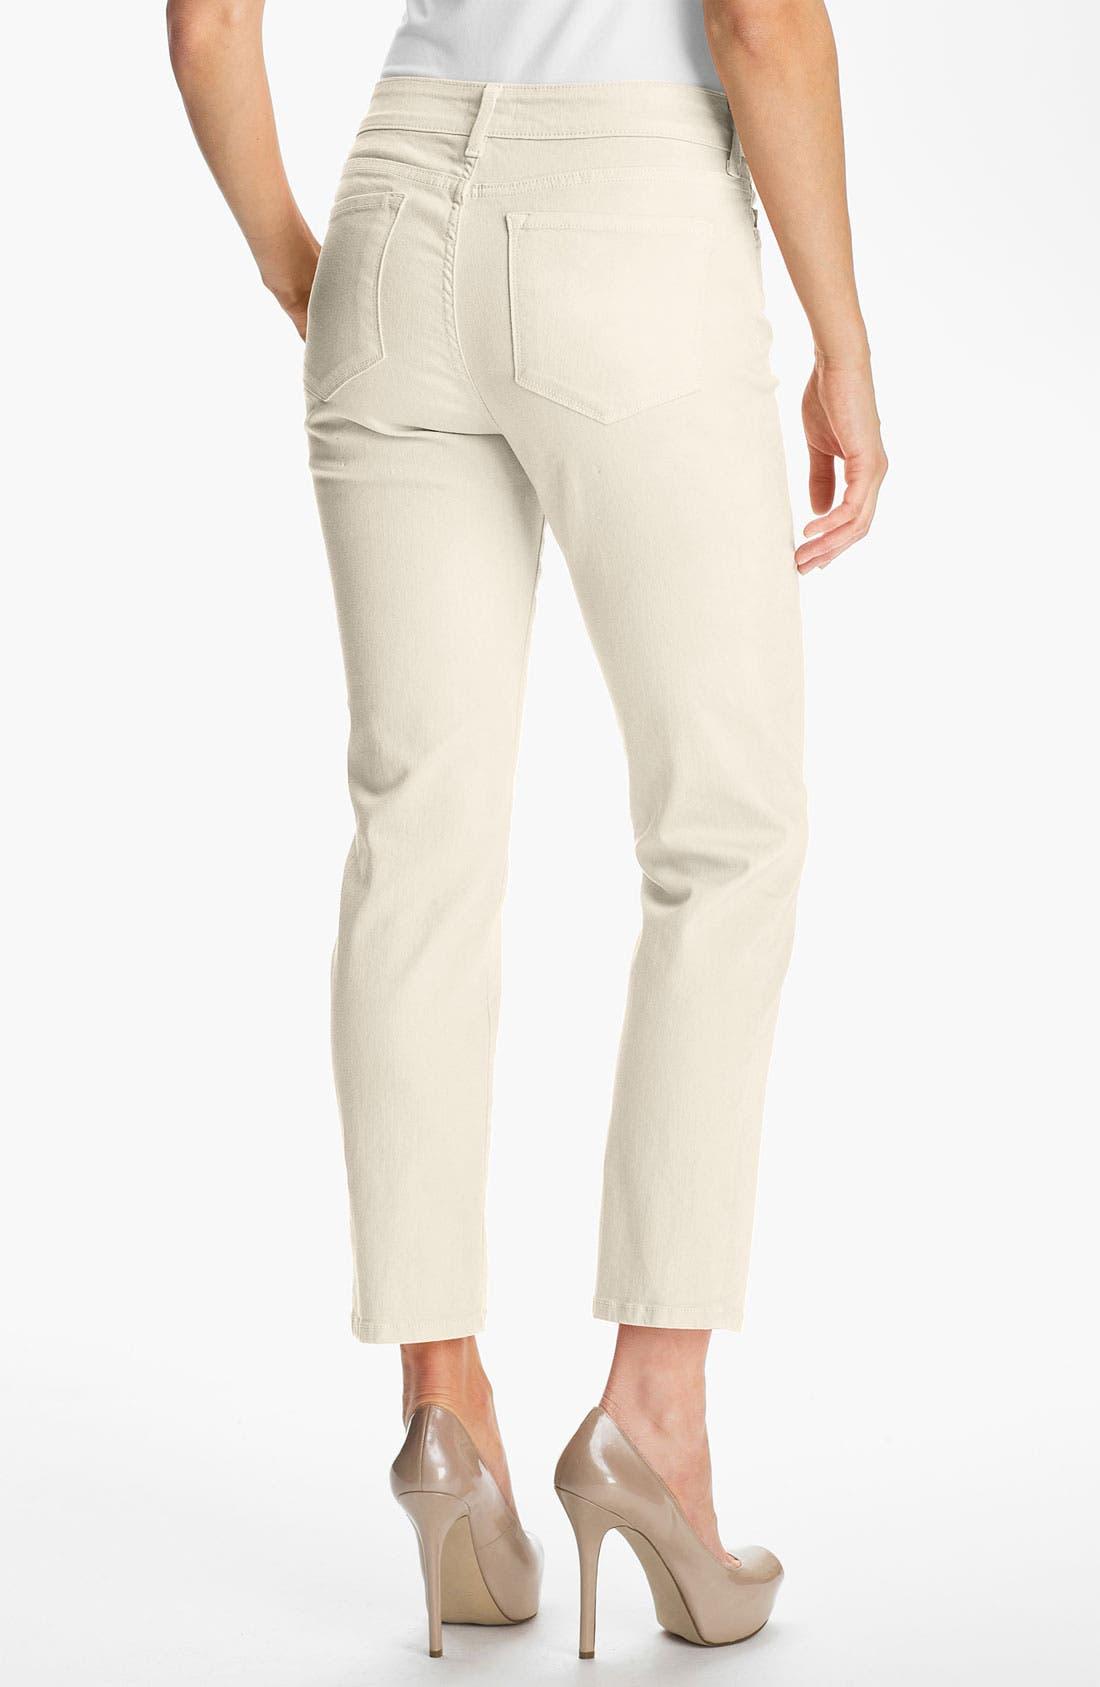 Alternate Image 2  - NYDJ 'Alisha' Skinny Stretch Ankle Jeans (Regular & Petite)